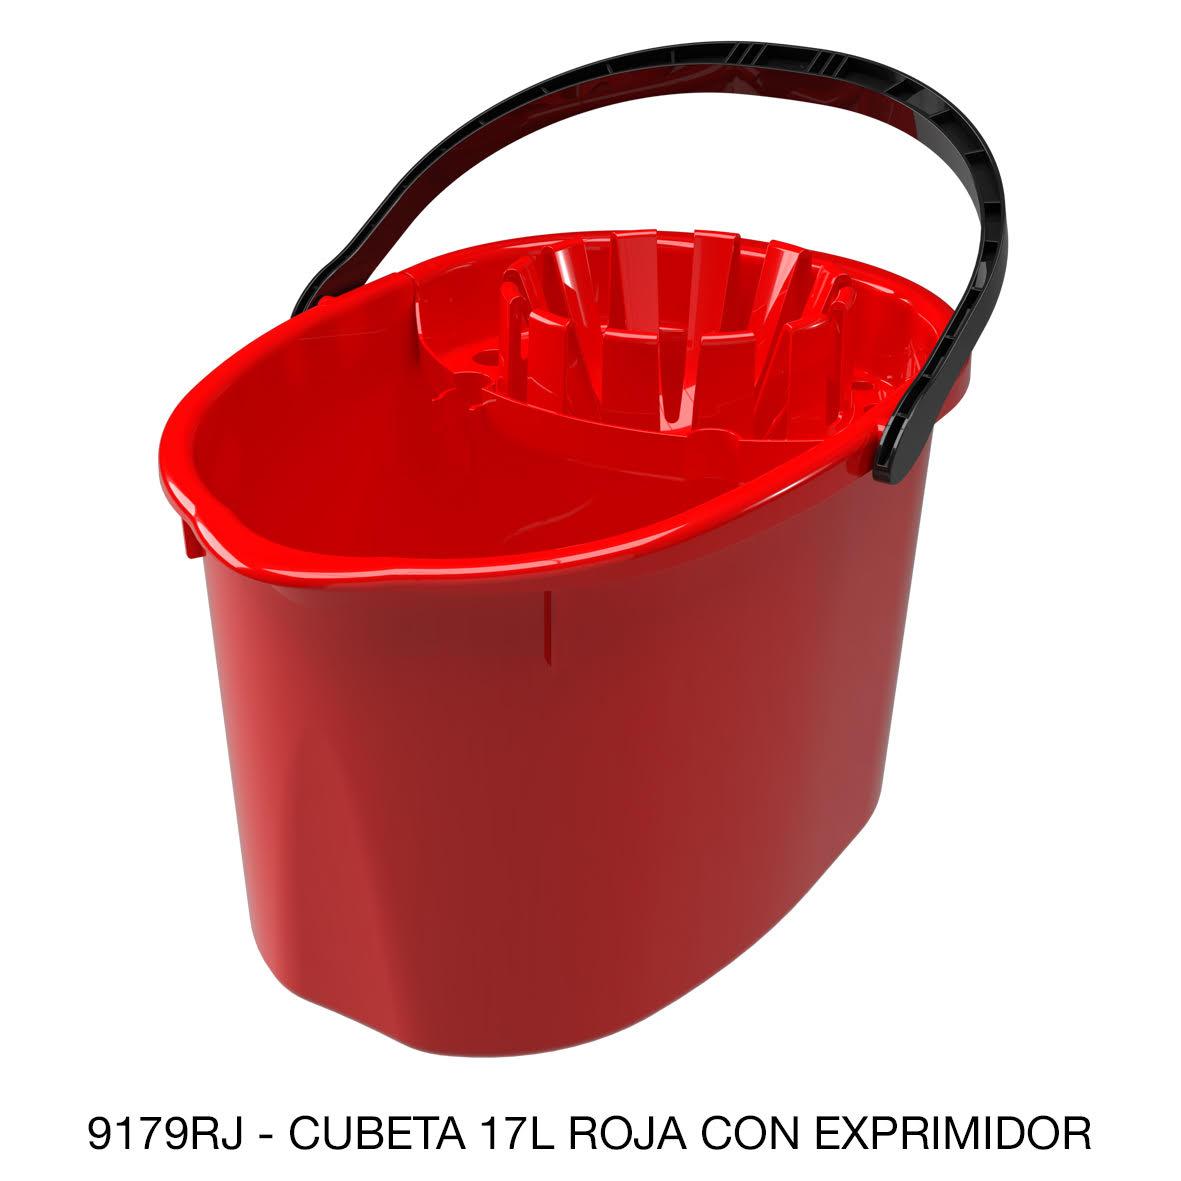 Cubeta de 17 litros con exprimidor color rojo modelo 9179RJ de Sablón